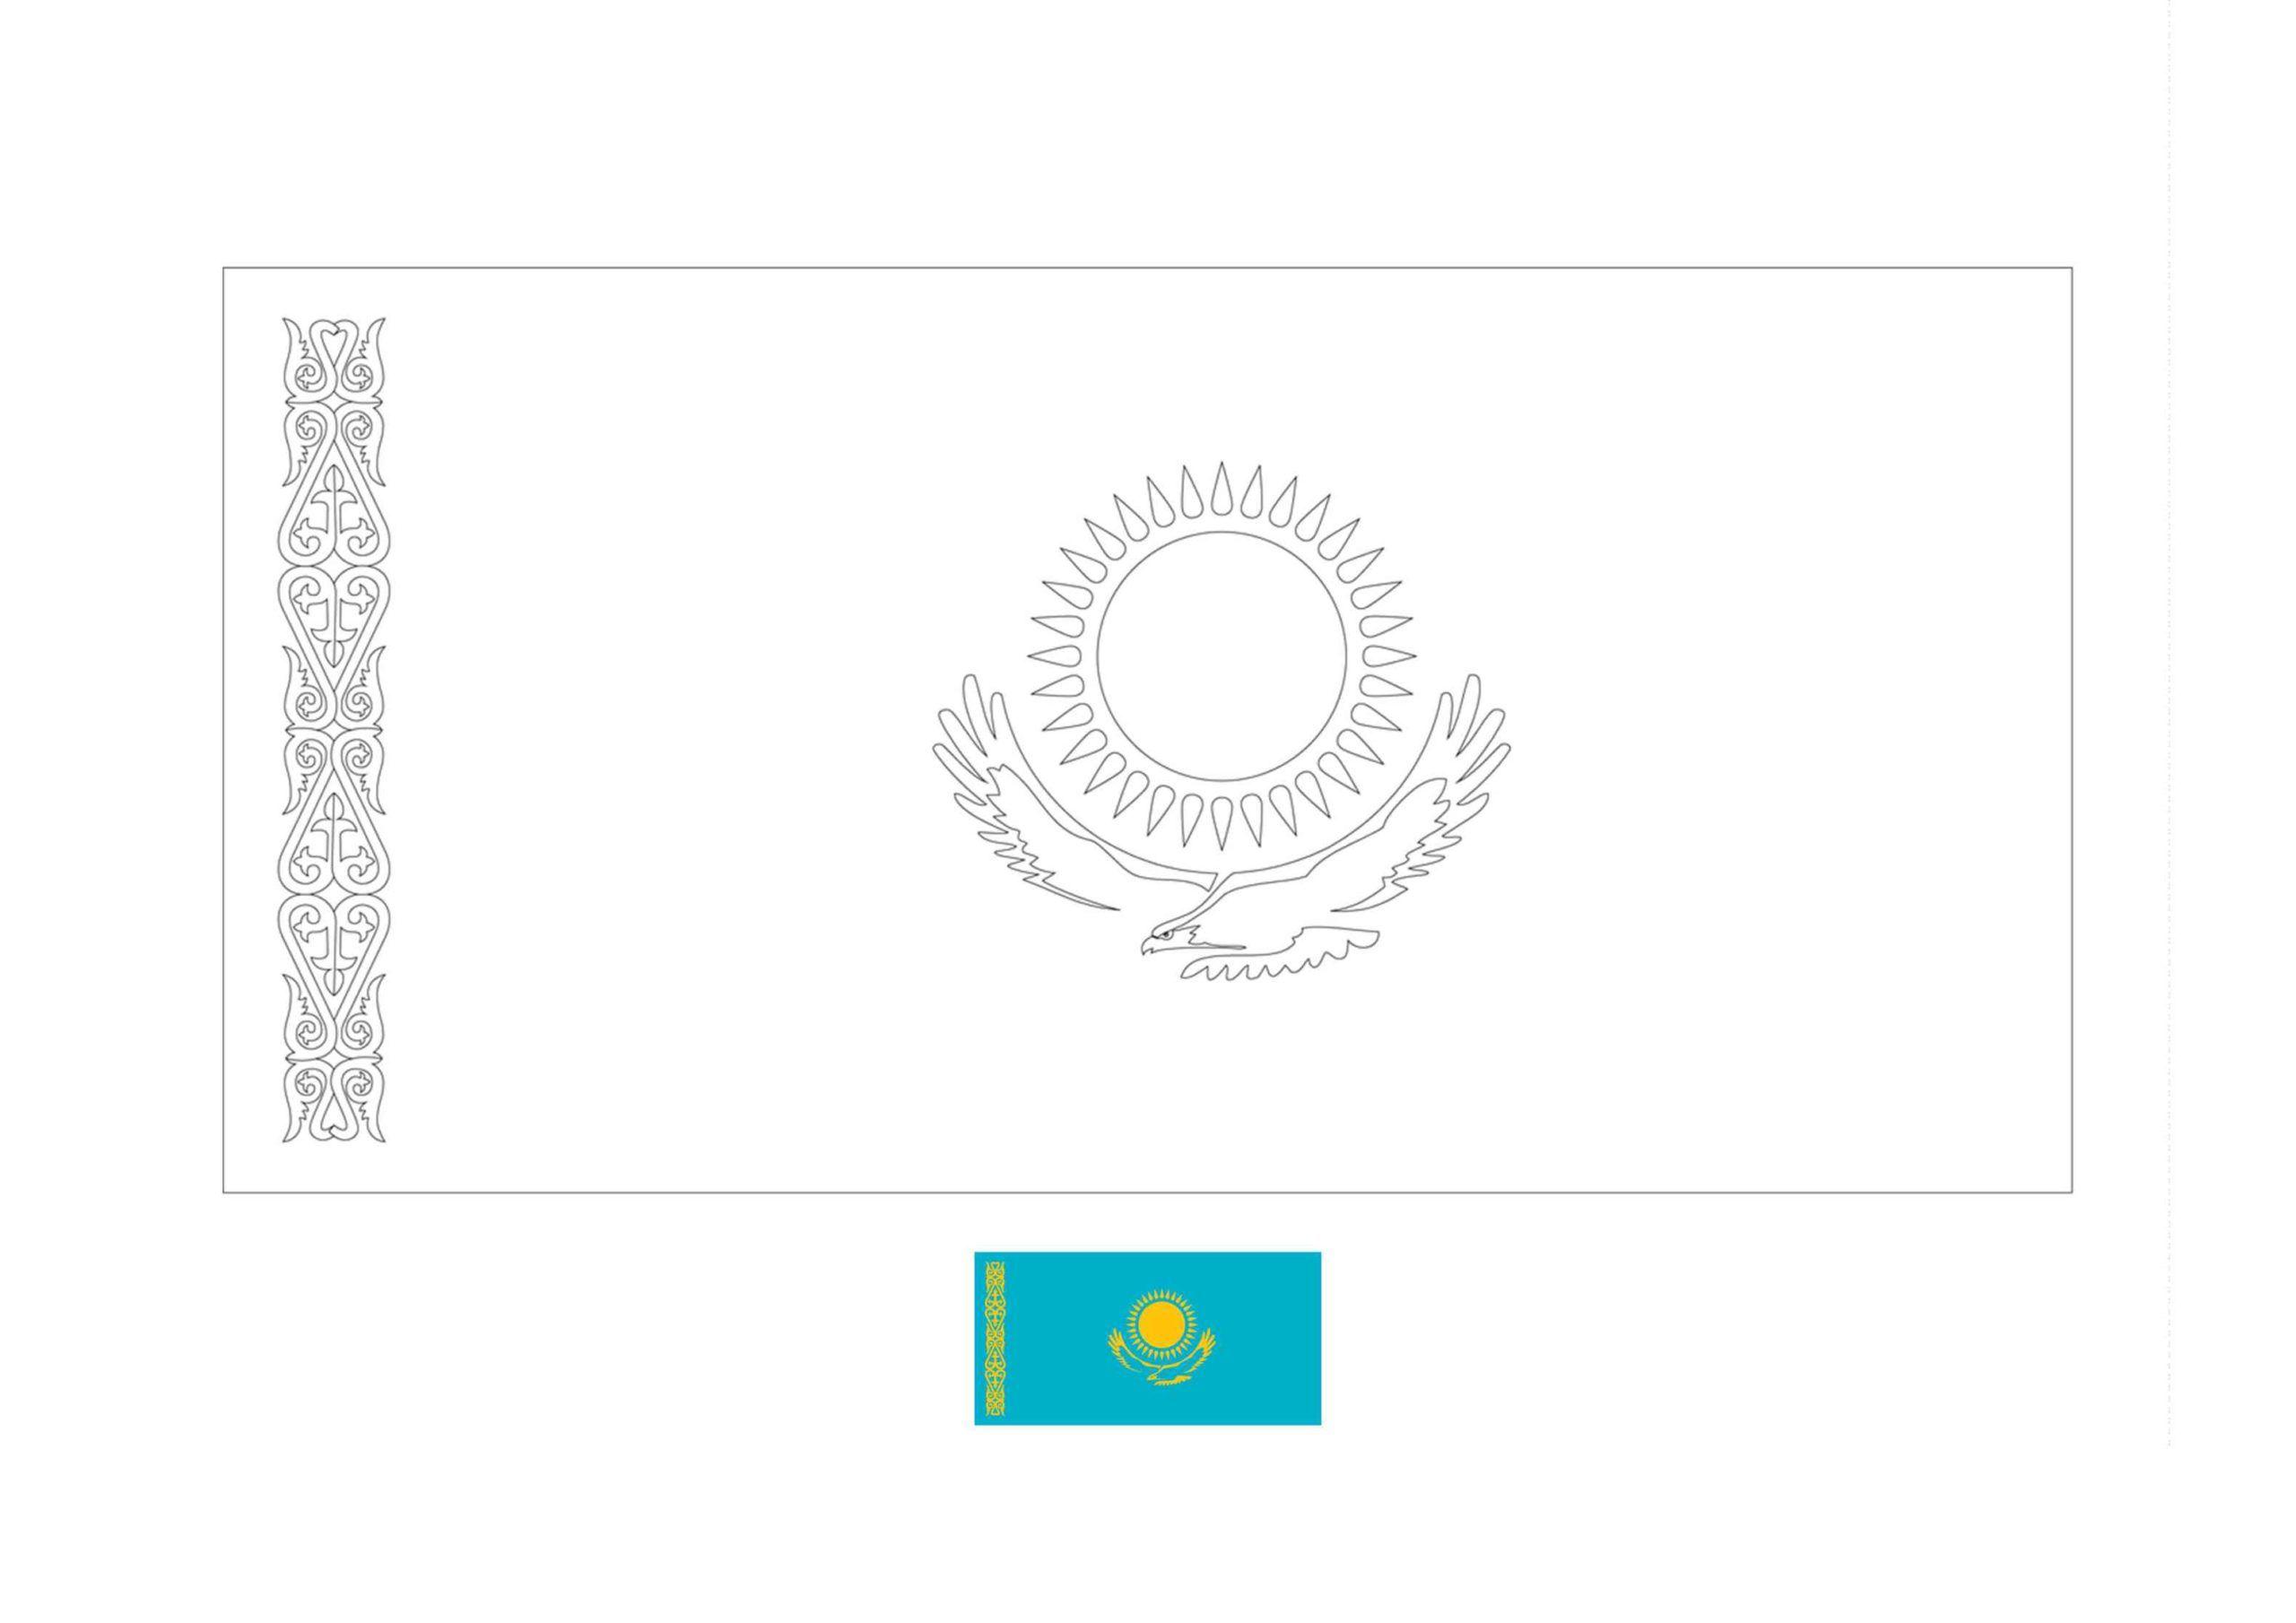 Kazakhstan Flag Coloring Page Coloring Pages Flag Coloring Pages Flag